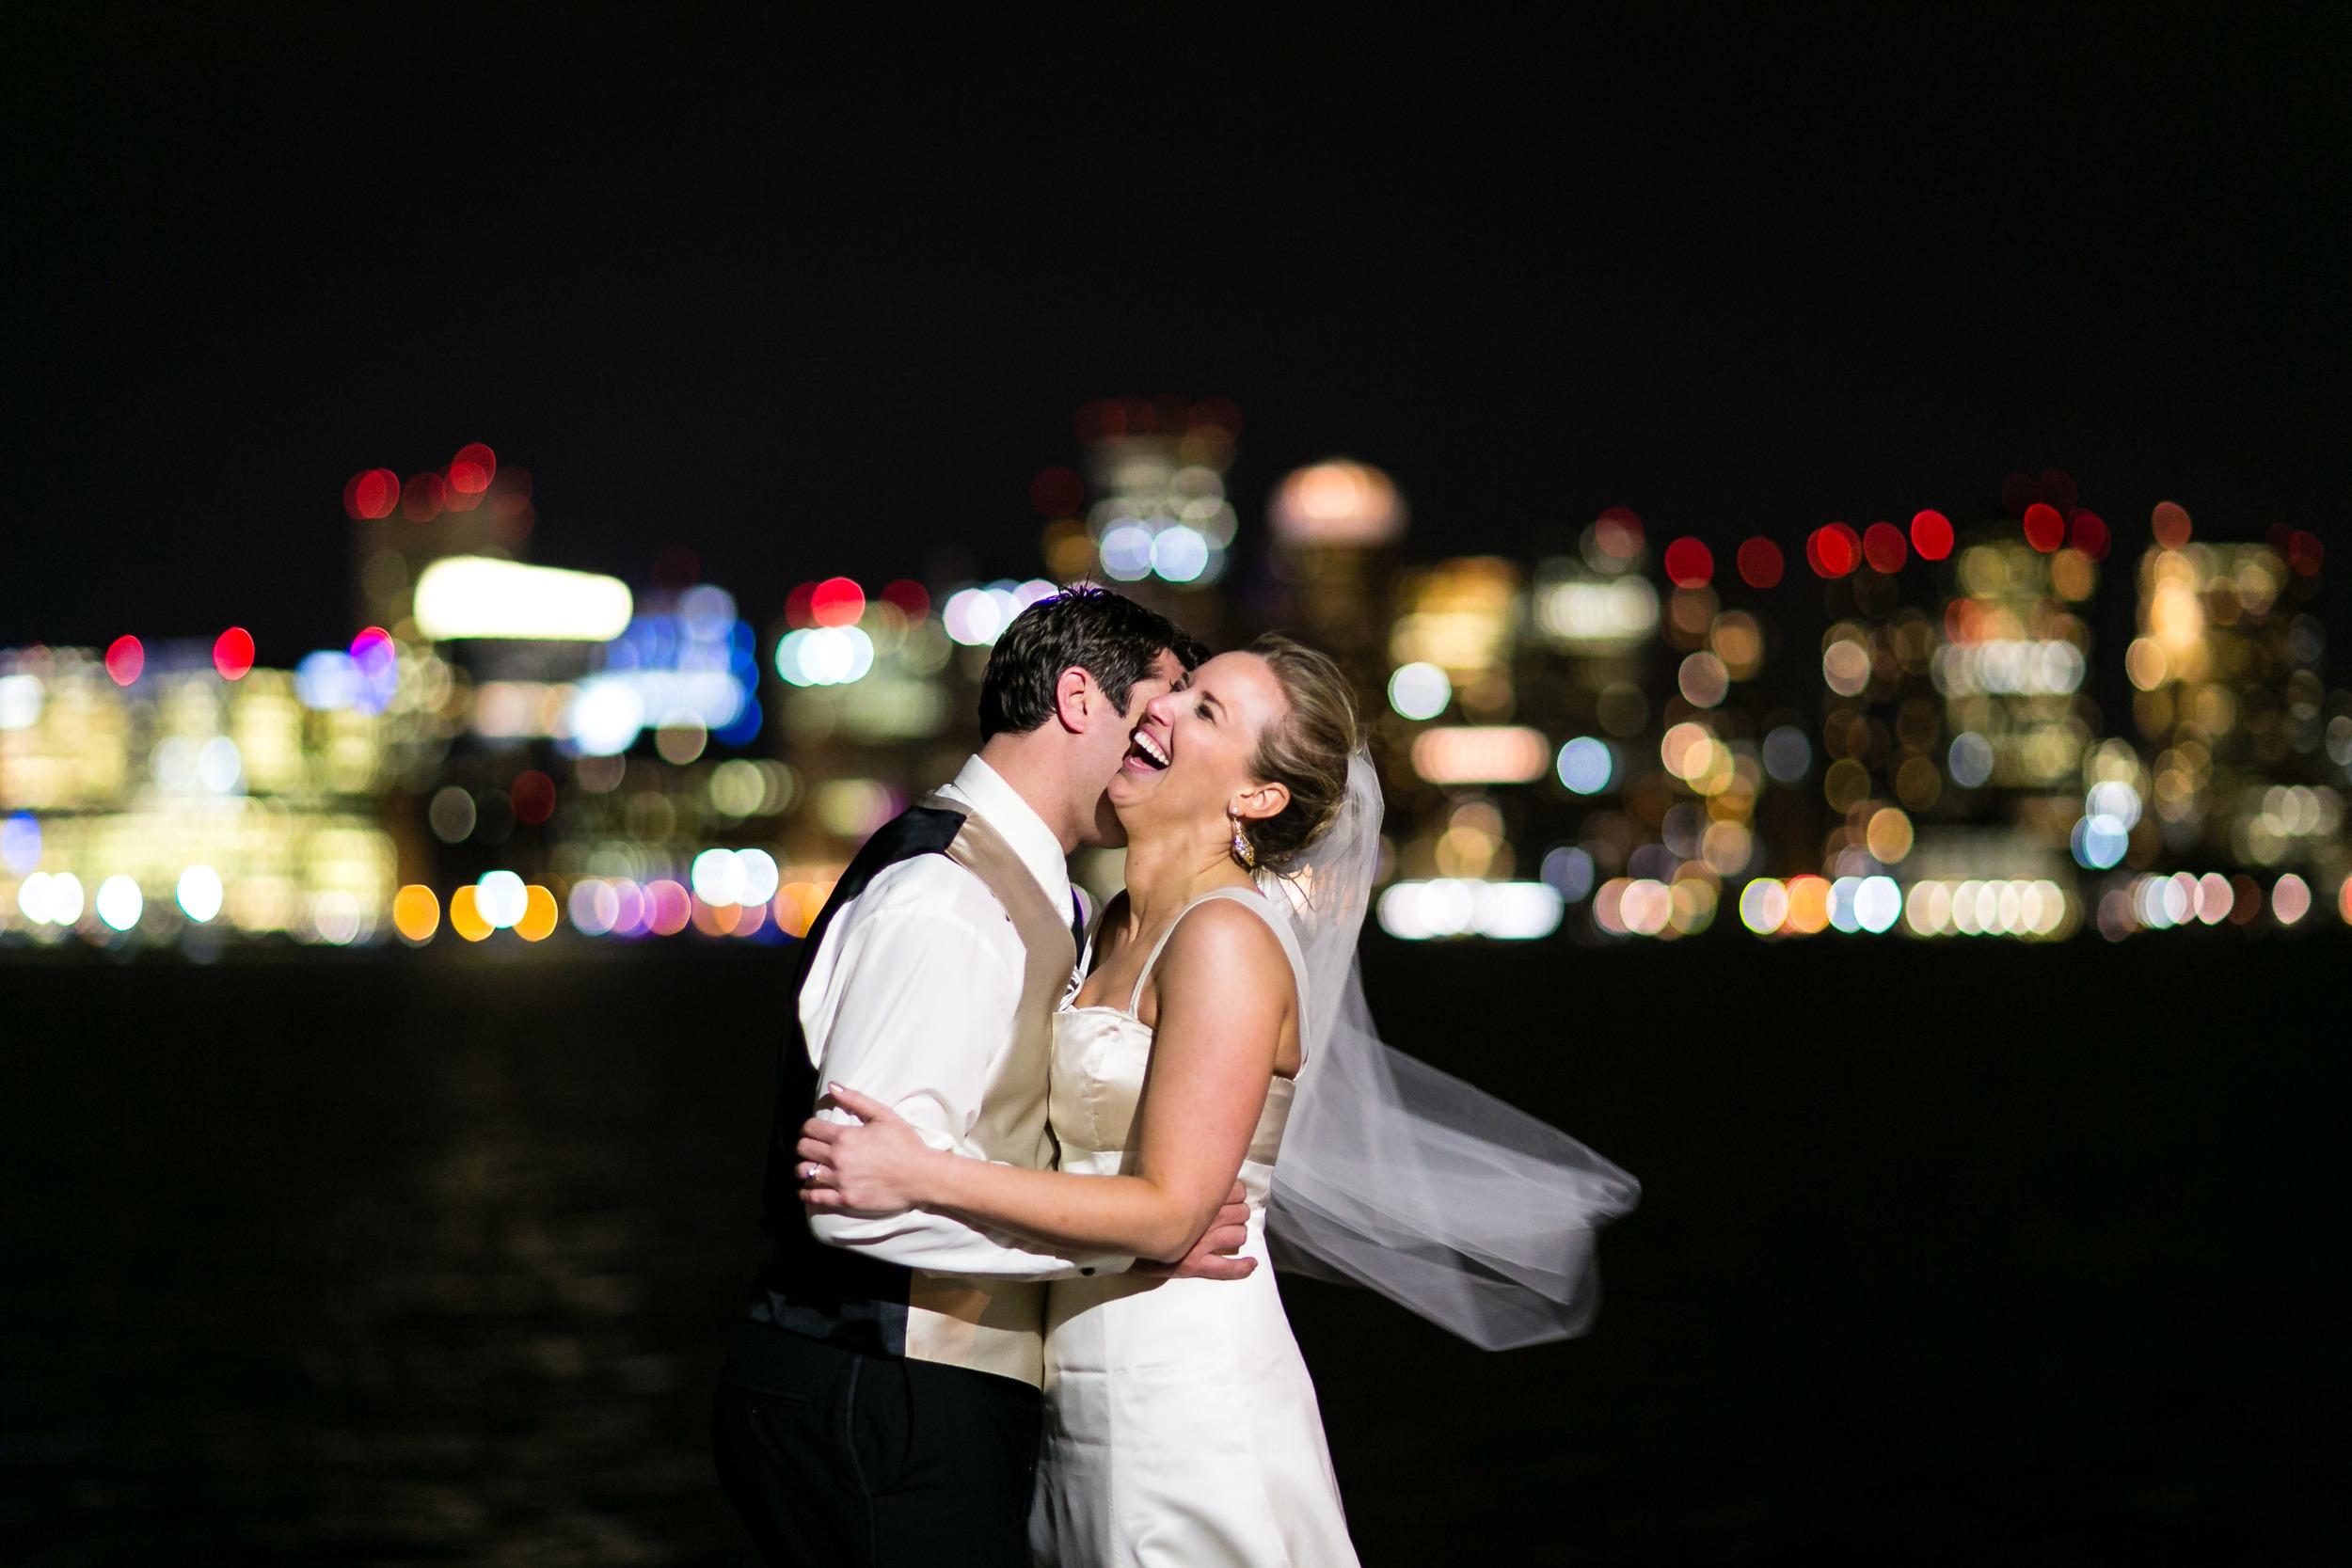 Romantic-Irish-Italian-Wedding-North-End-Boston-MA-Photojournalistic-Wedding-Photography-by-Jacek-Dolata-16.jpg